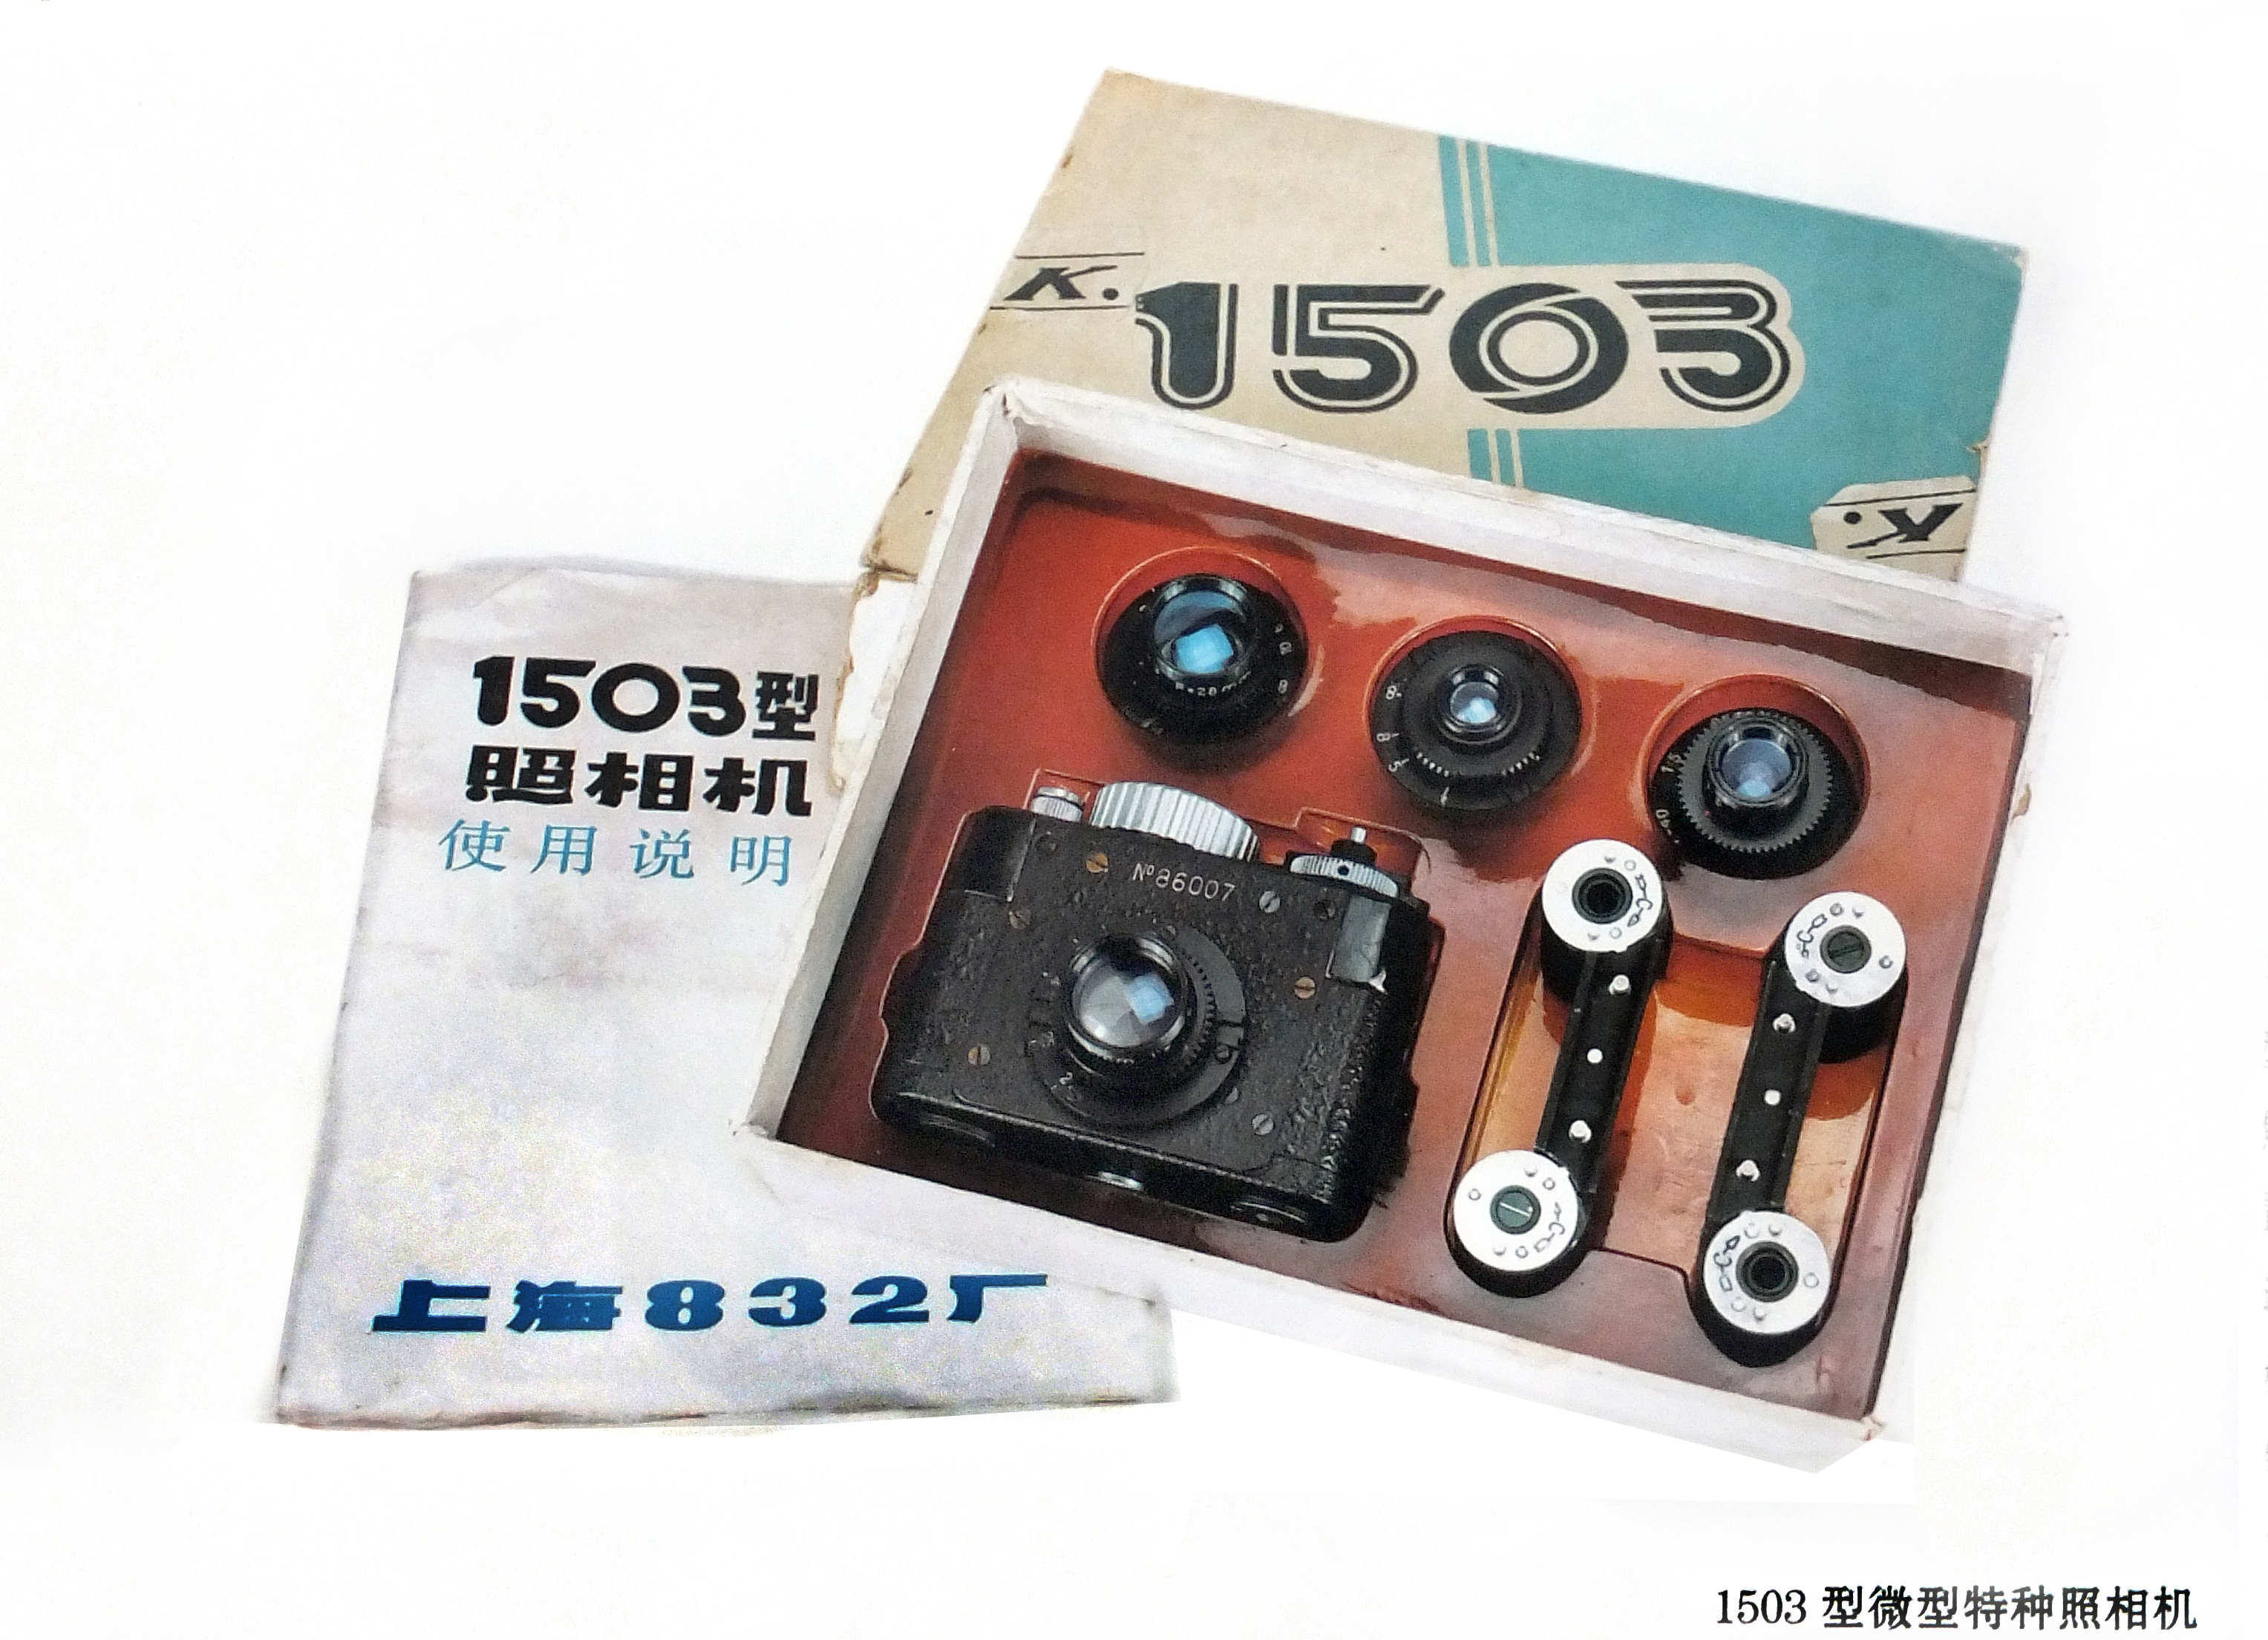 K1503 spy camera